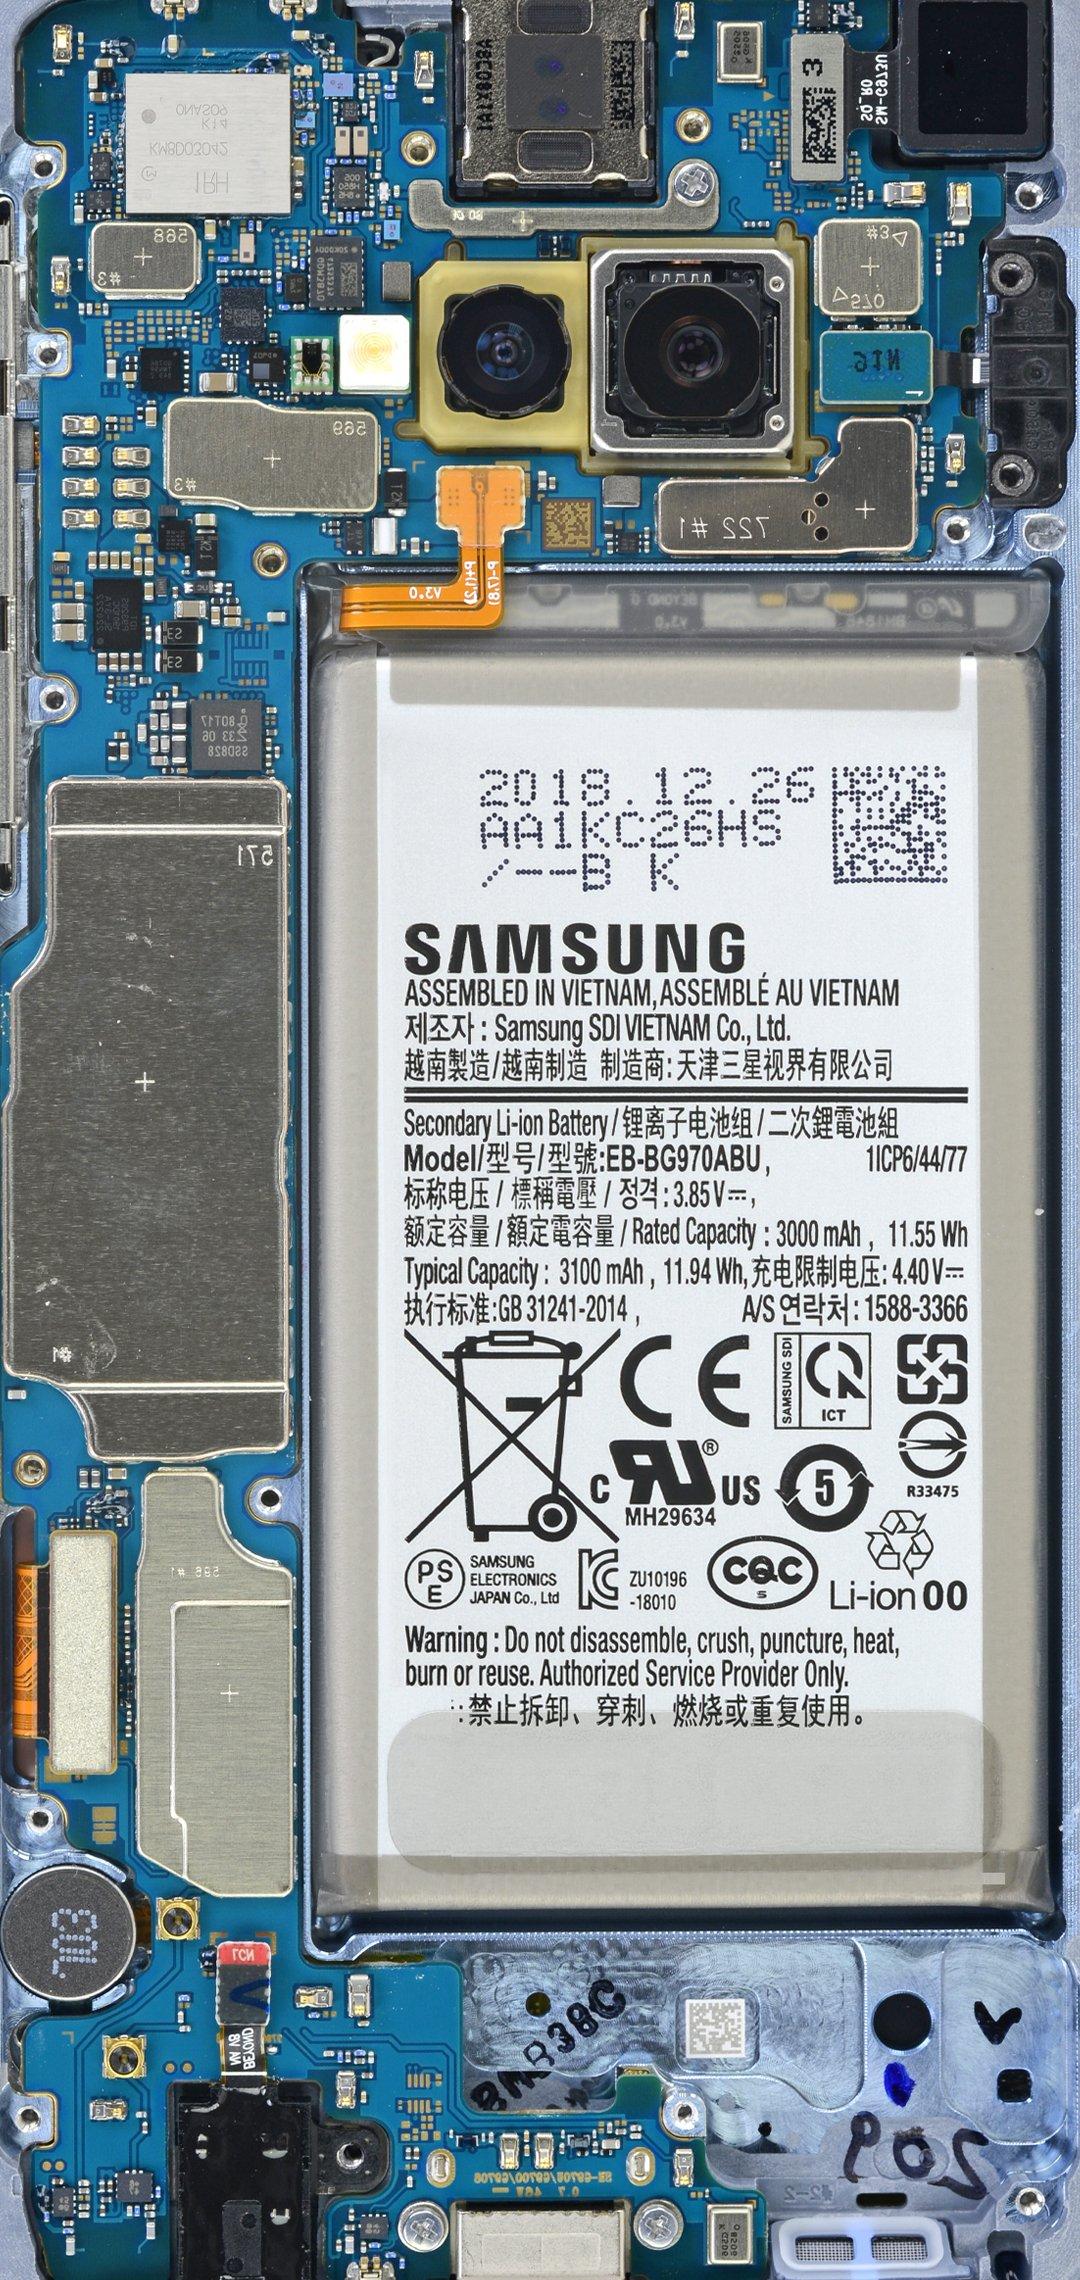 Samsung Galaxy S10 S10e Teardown Wallpapers Ifixit